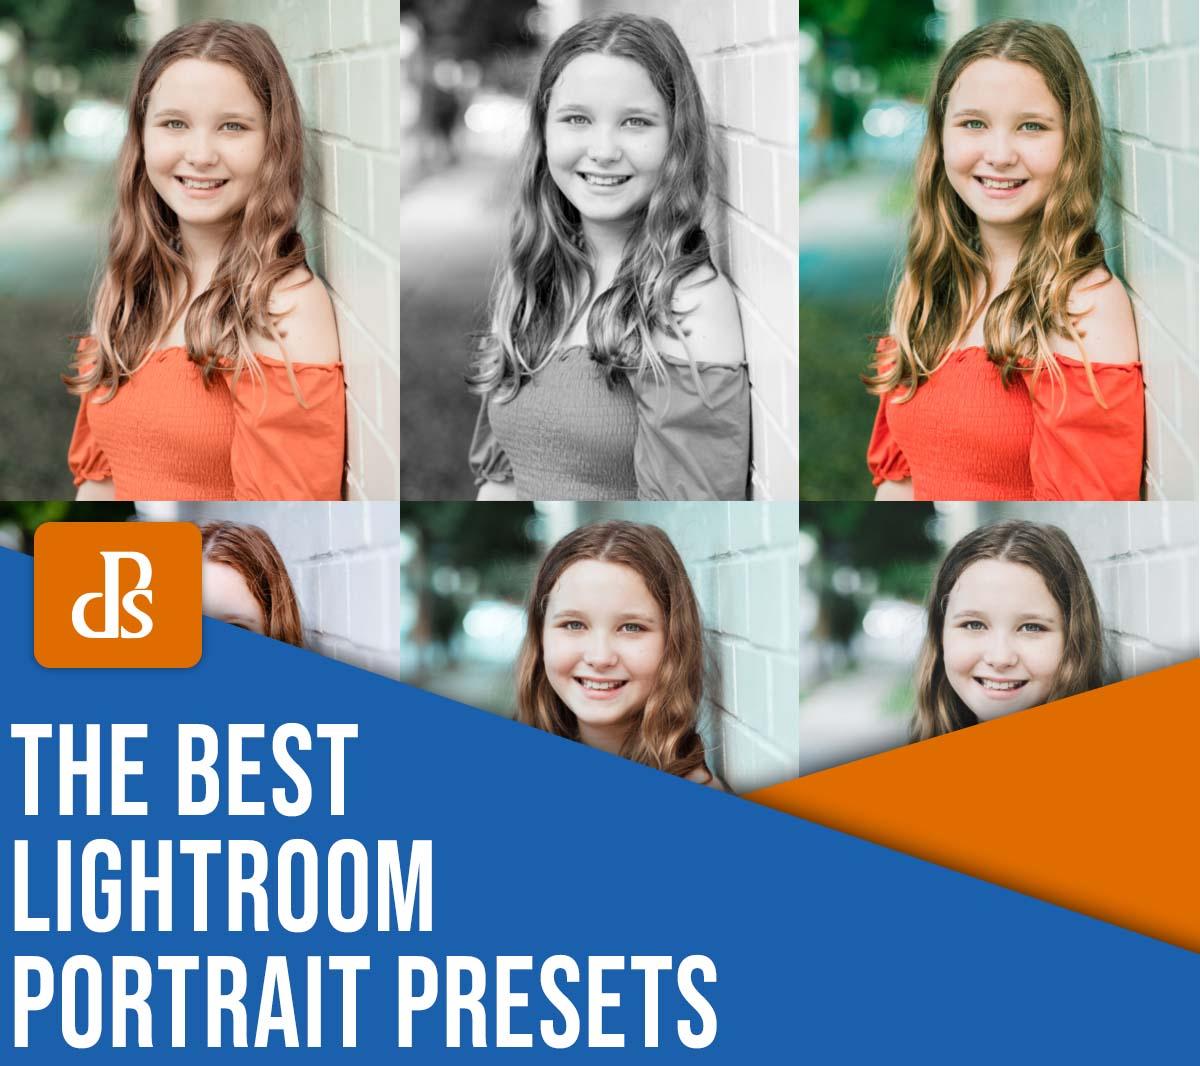 the best Lightroom portrait presets